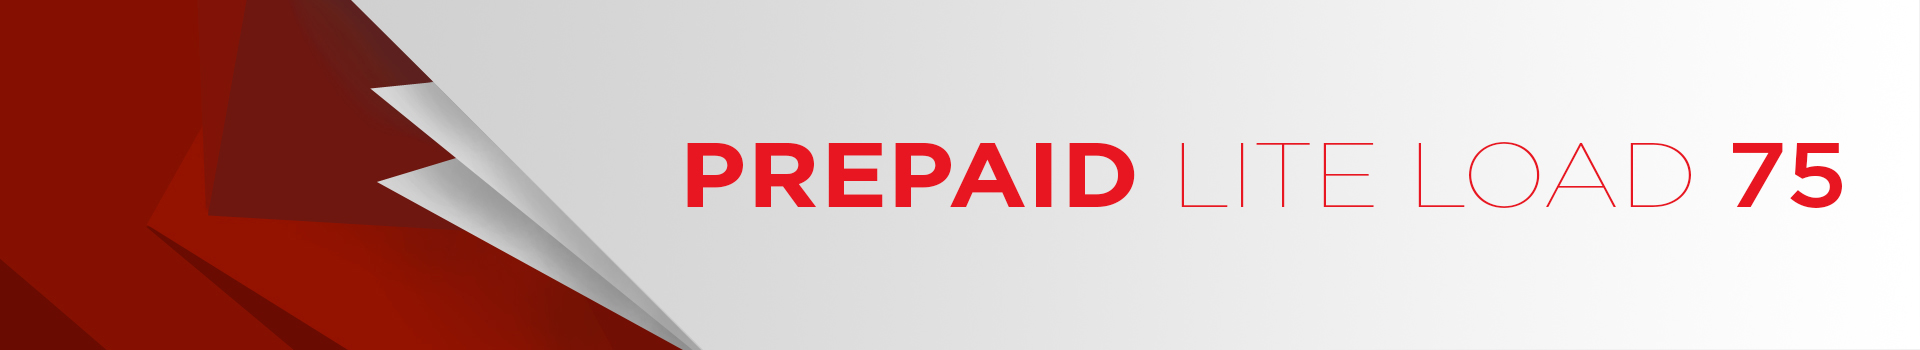 Prepaid Lite Loads Banner